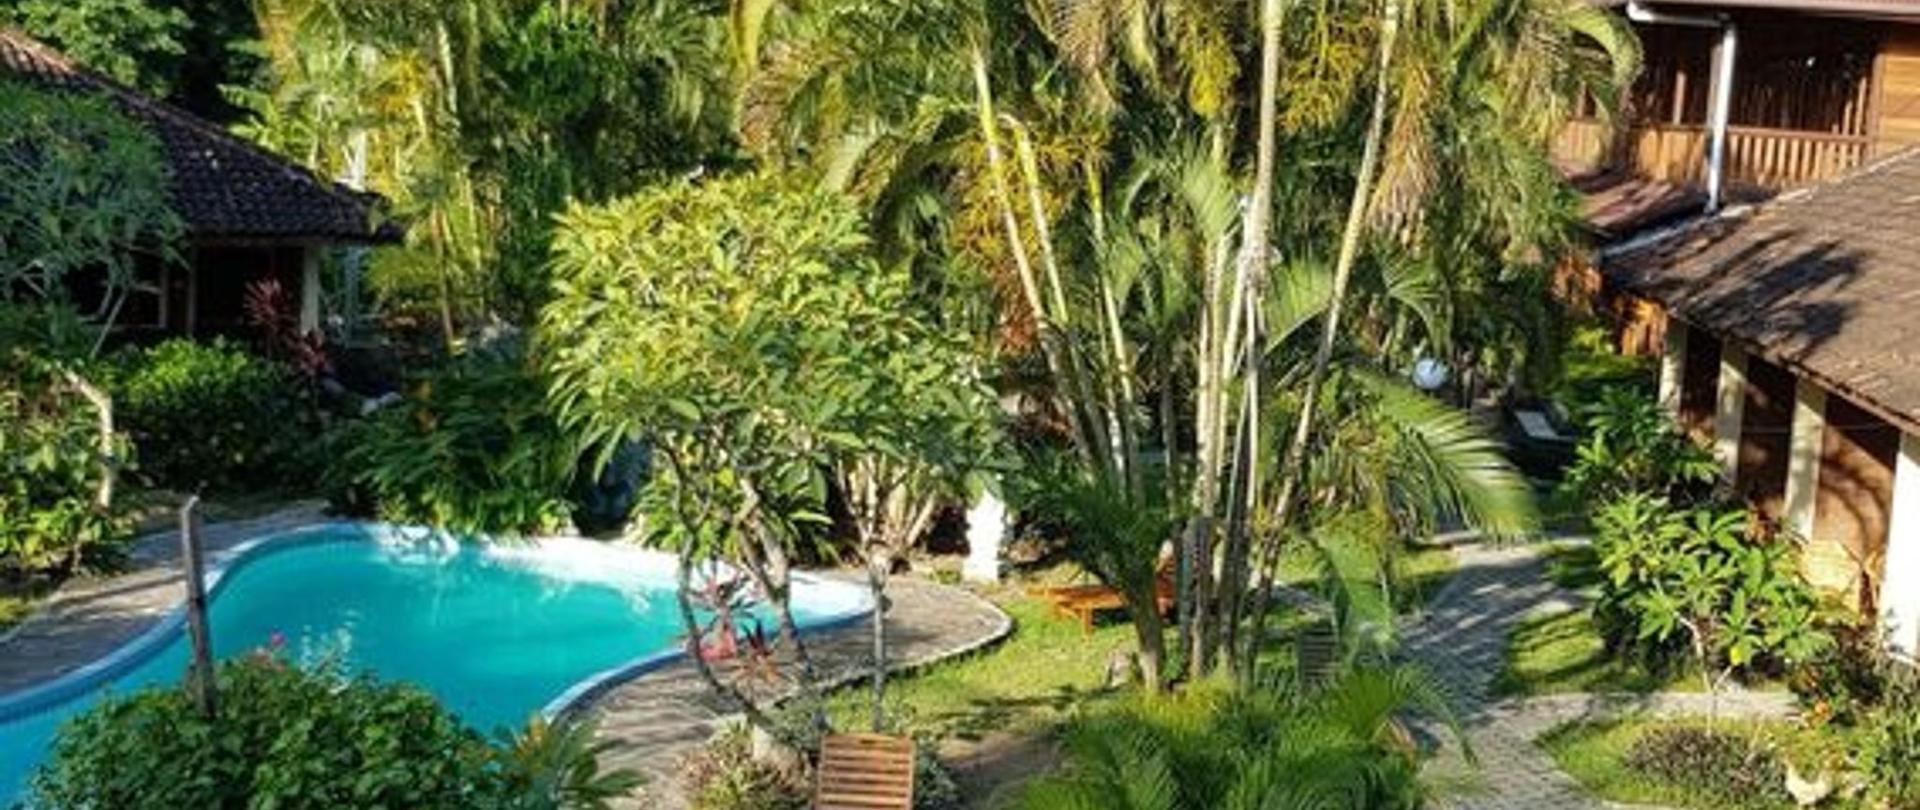 hotelsdotcom-1264741120-cb651ce5_w-457047.jpg